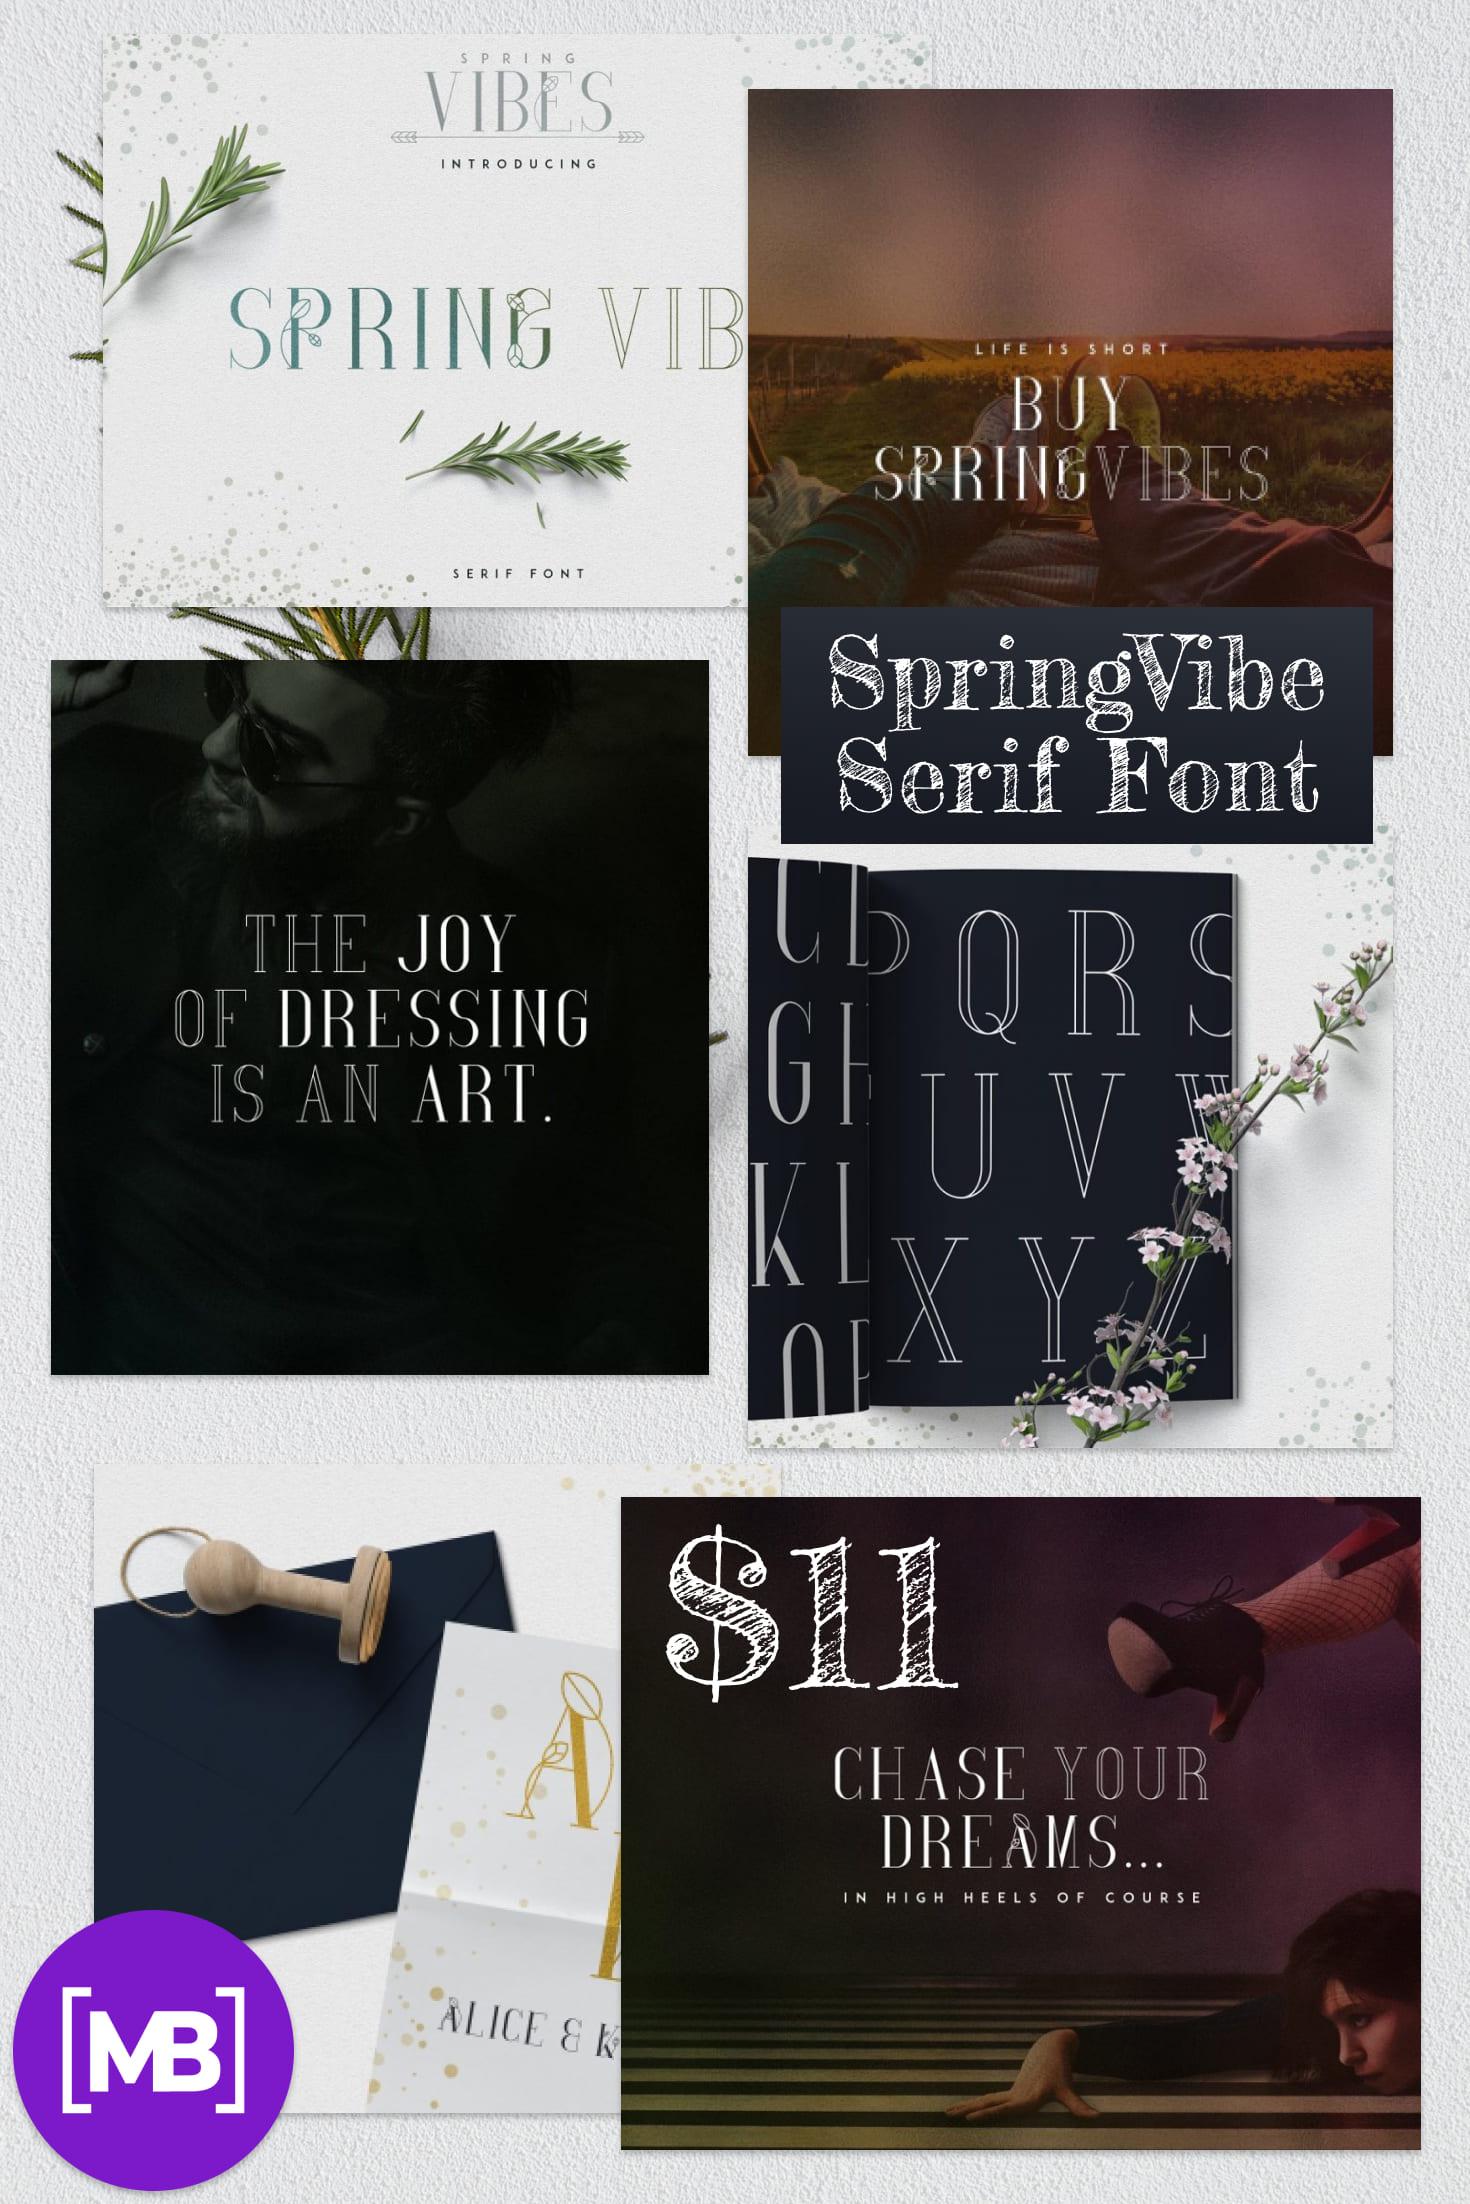 Pinterest Image: Spring Font with 30% OFF - SpringVibe Serif Font.